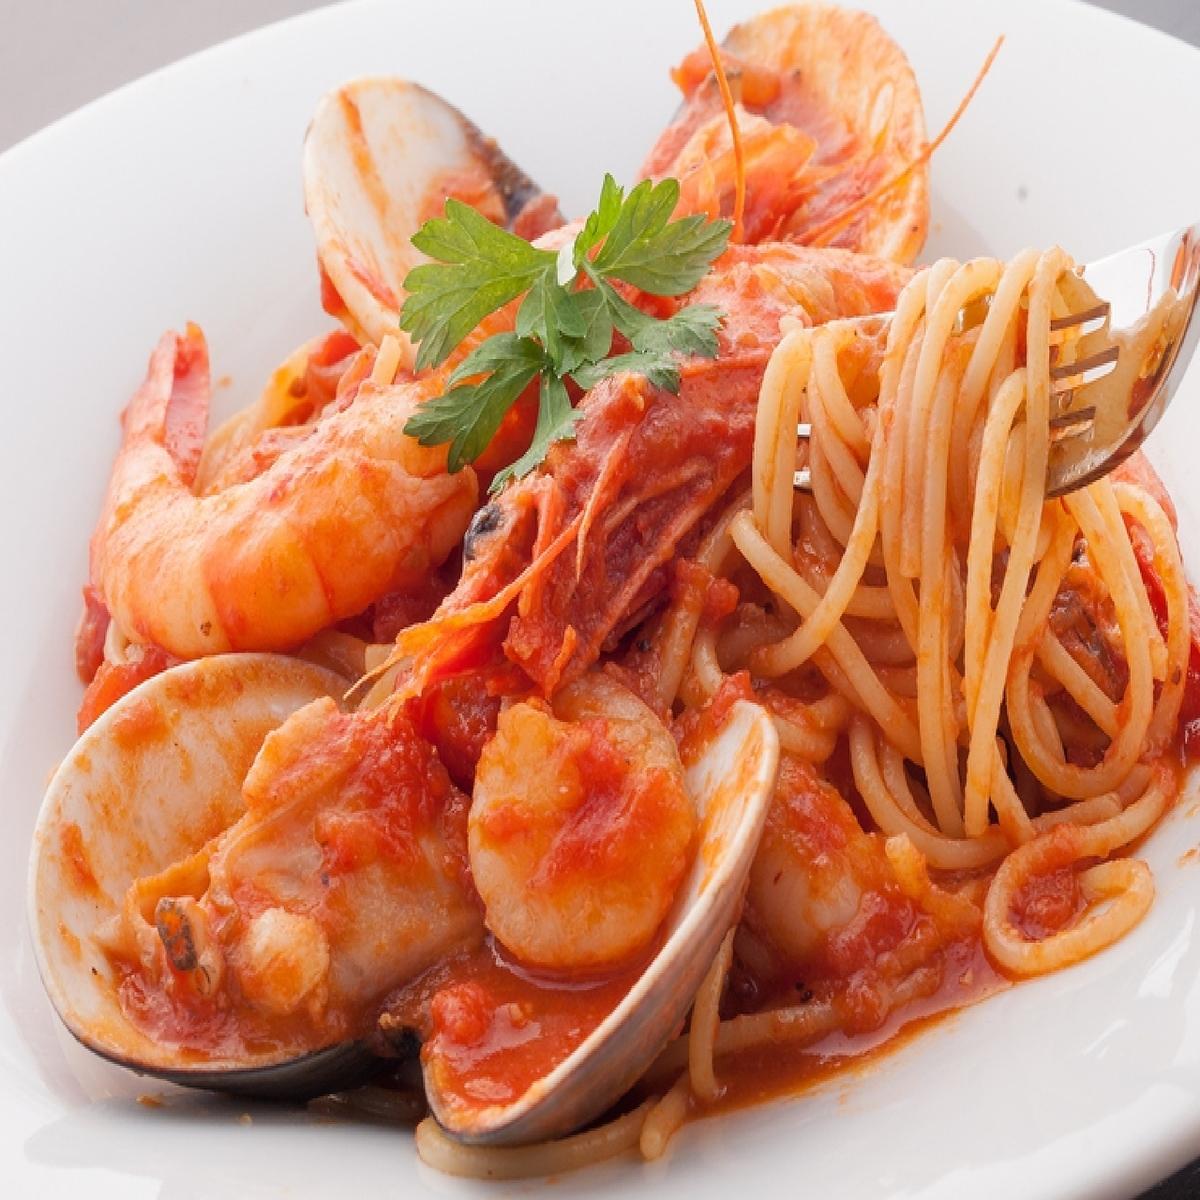 Chef's entrusted pasta